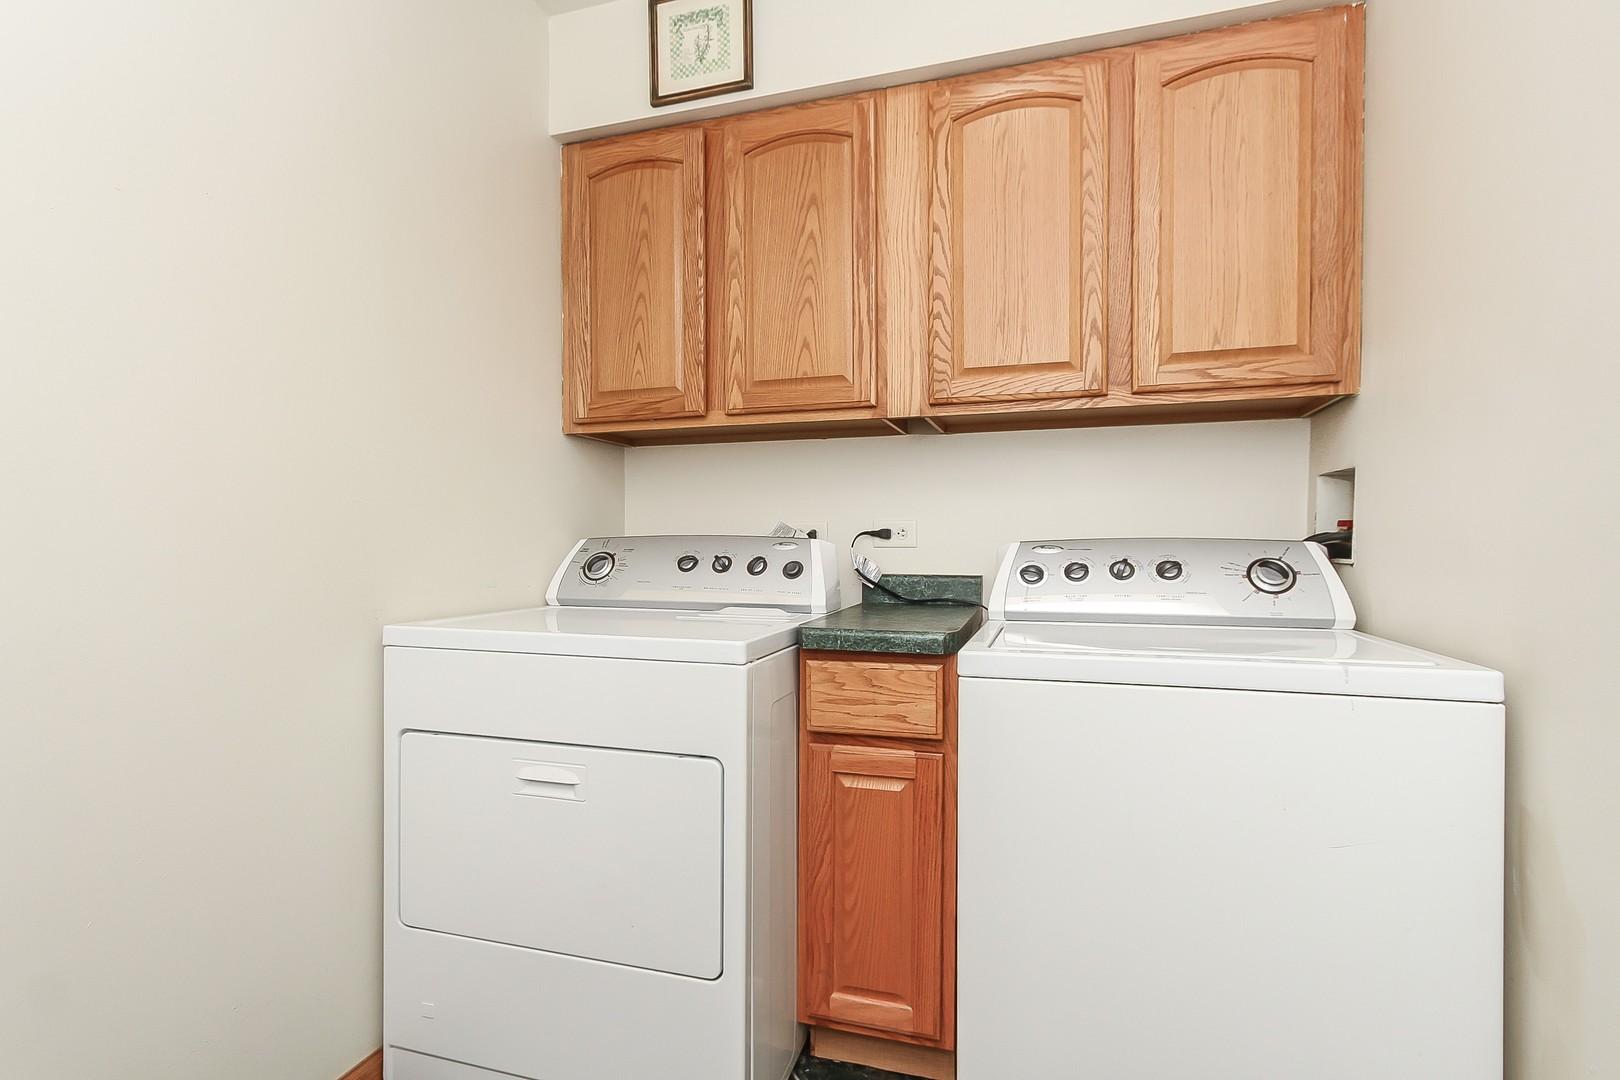 HD_1602872575076_014_Laundry_Room